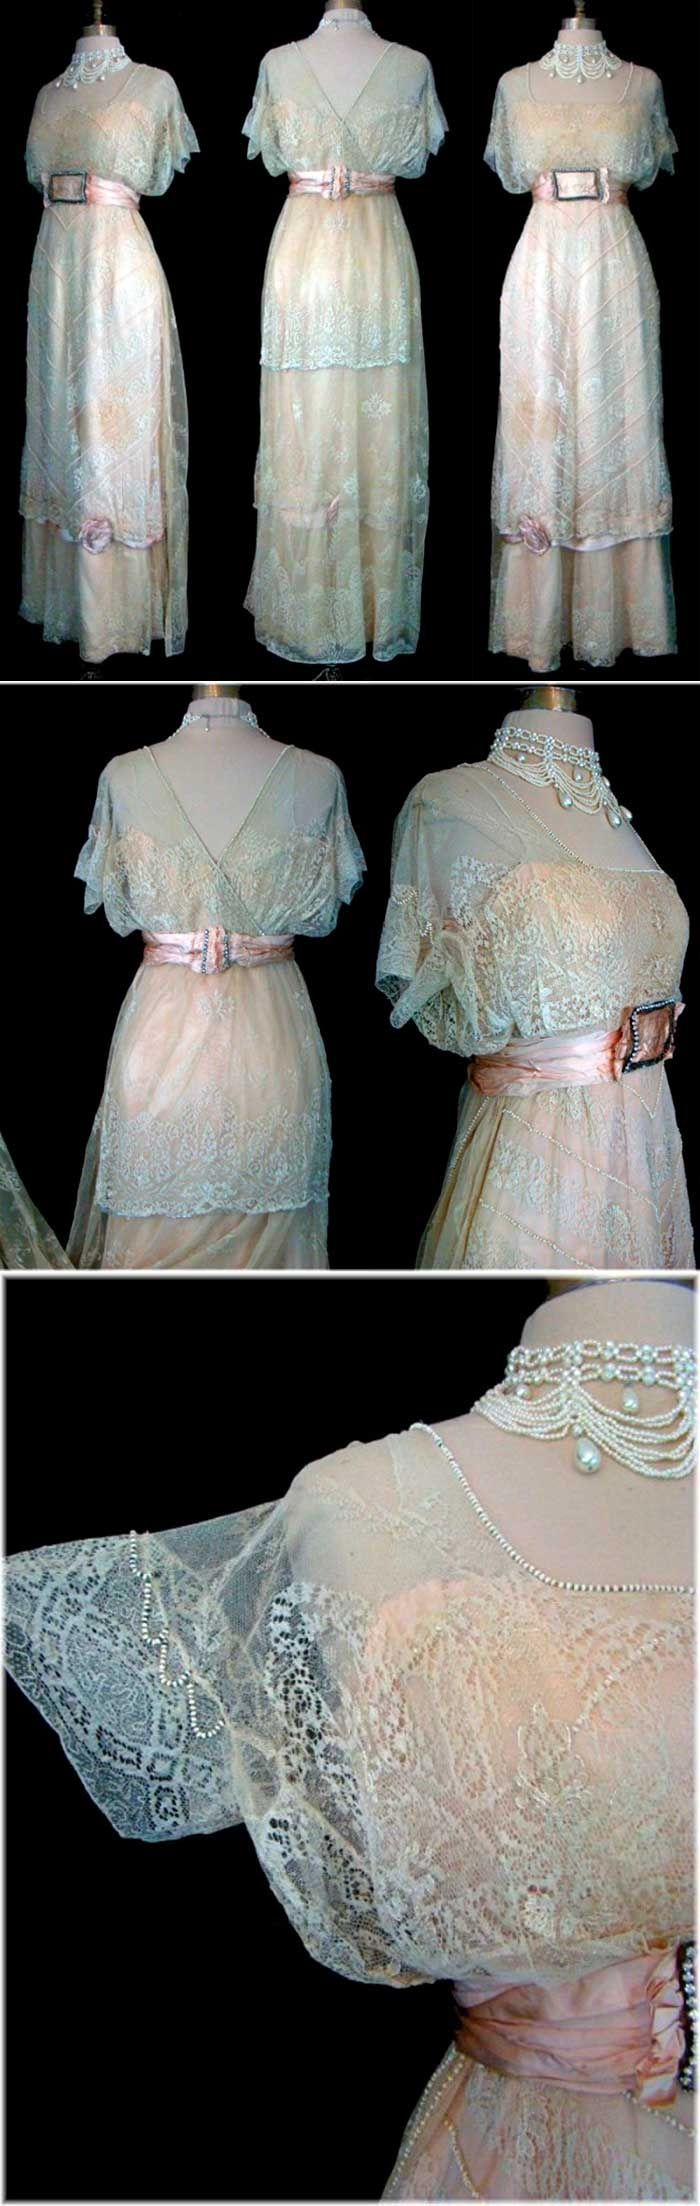 Vestido en mezcla de texturas, visto en detalle.